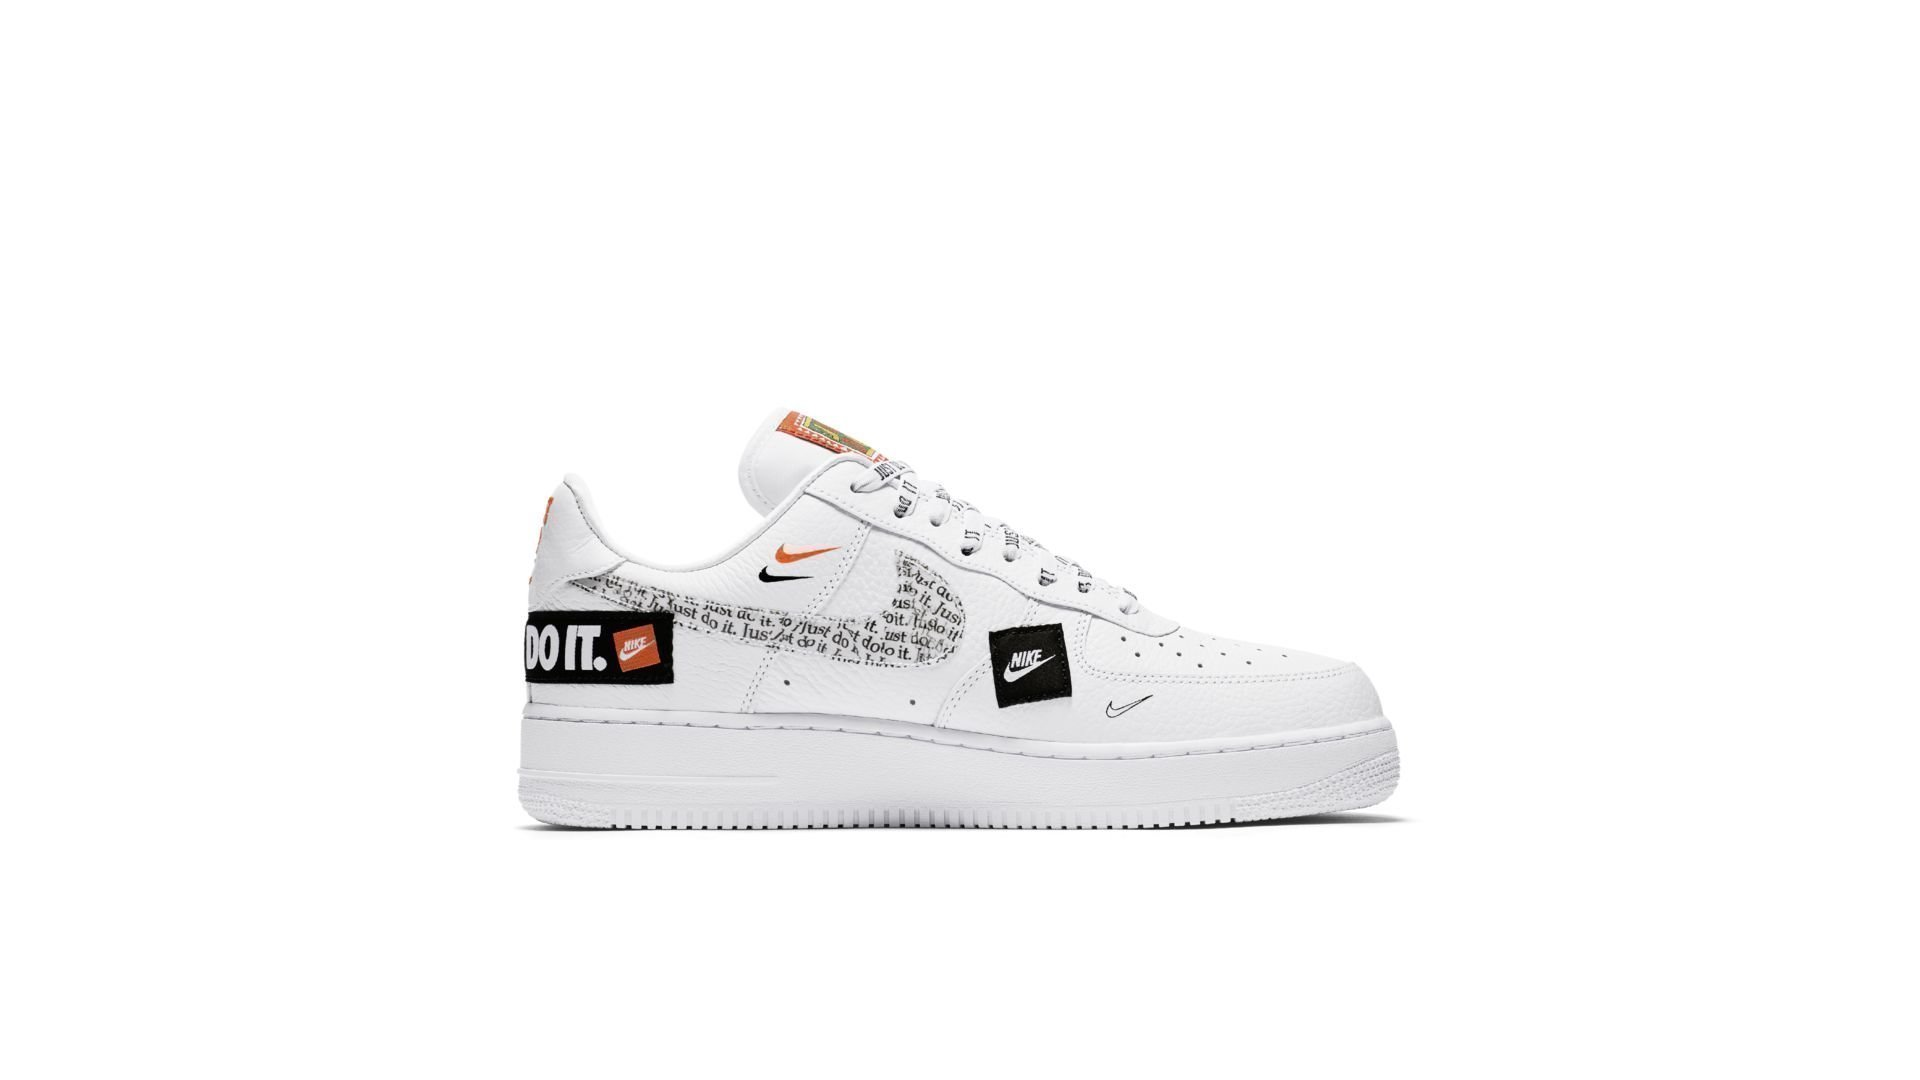 Nike Air Force 1 '07 Premium JDI  (AR7719-100)